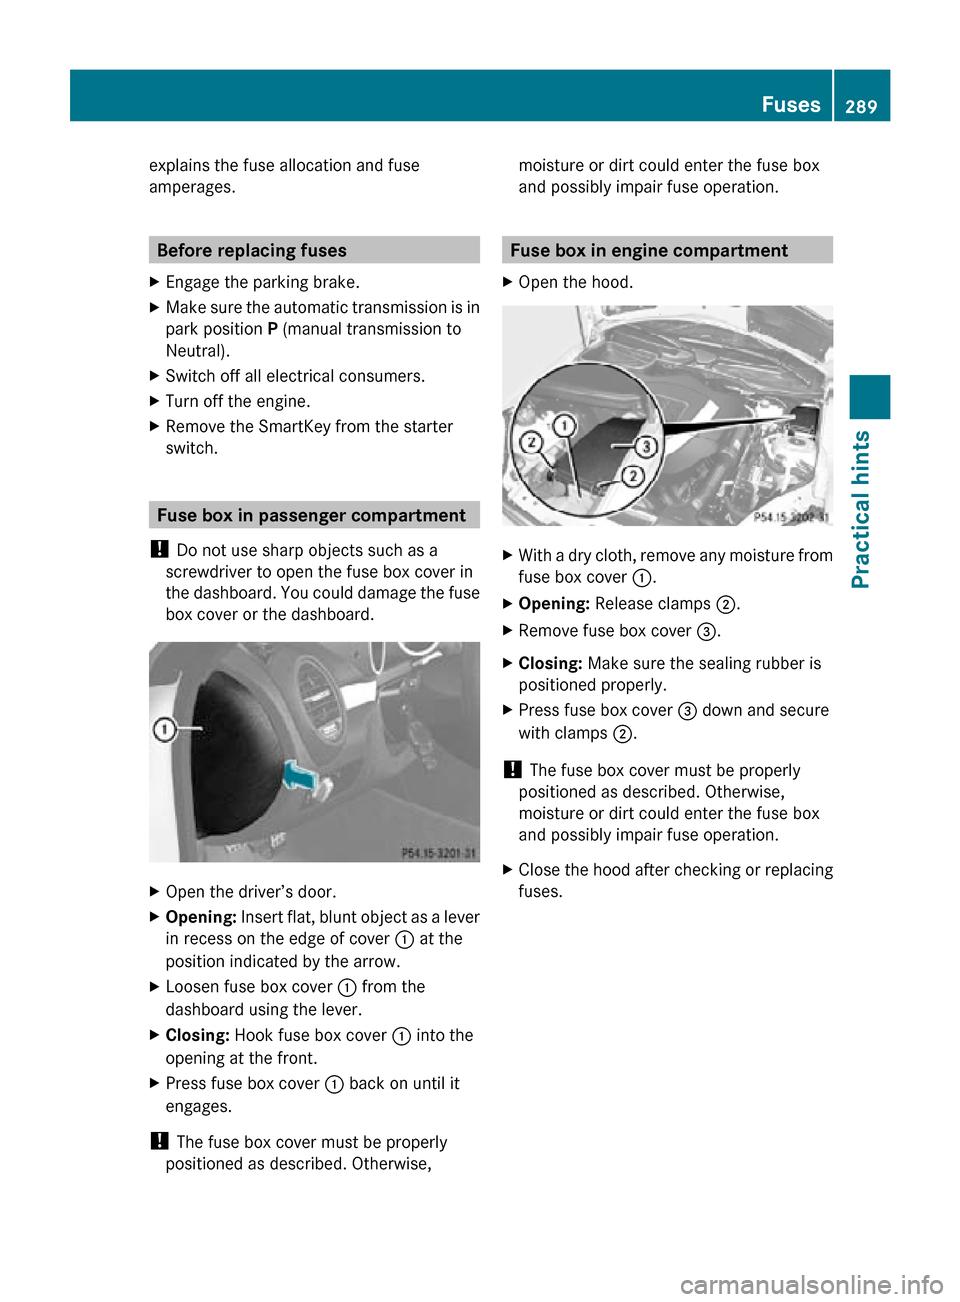 Mercedes Benz Slk300 2010 R171 Owners Manual Valeo Alternator Wiring Diagram 1230 Page 291